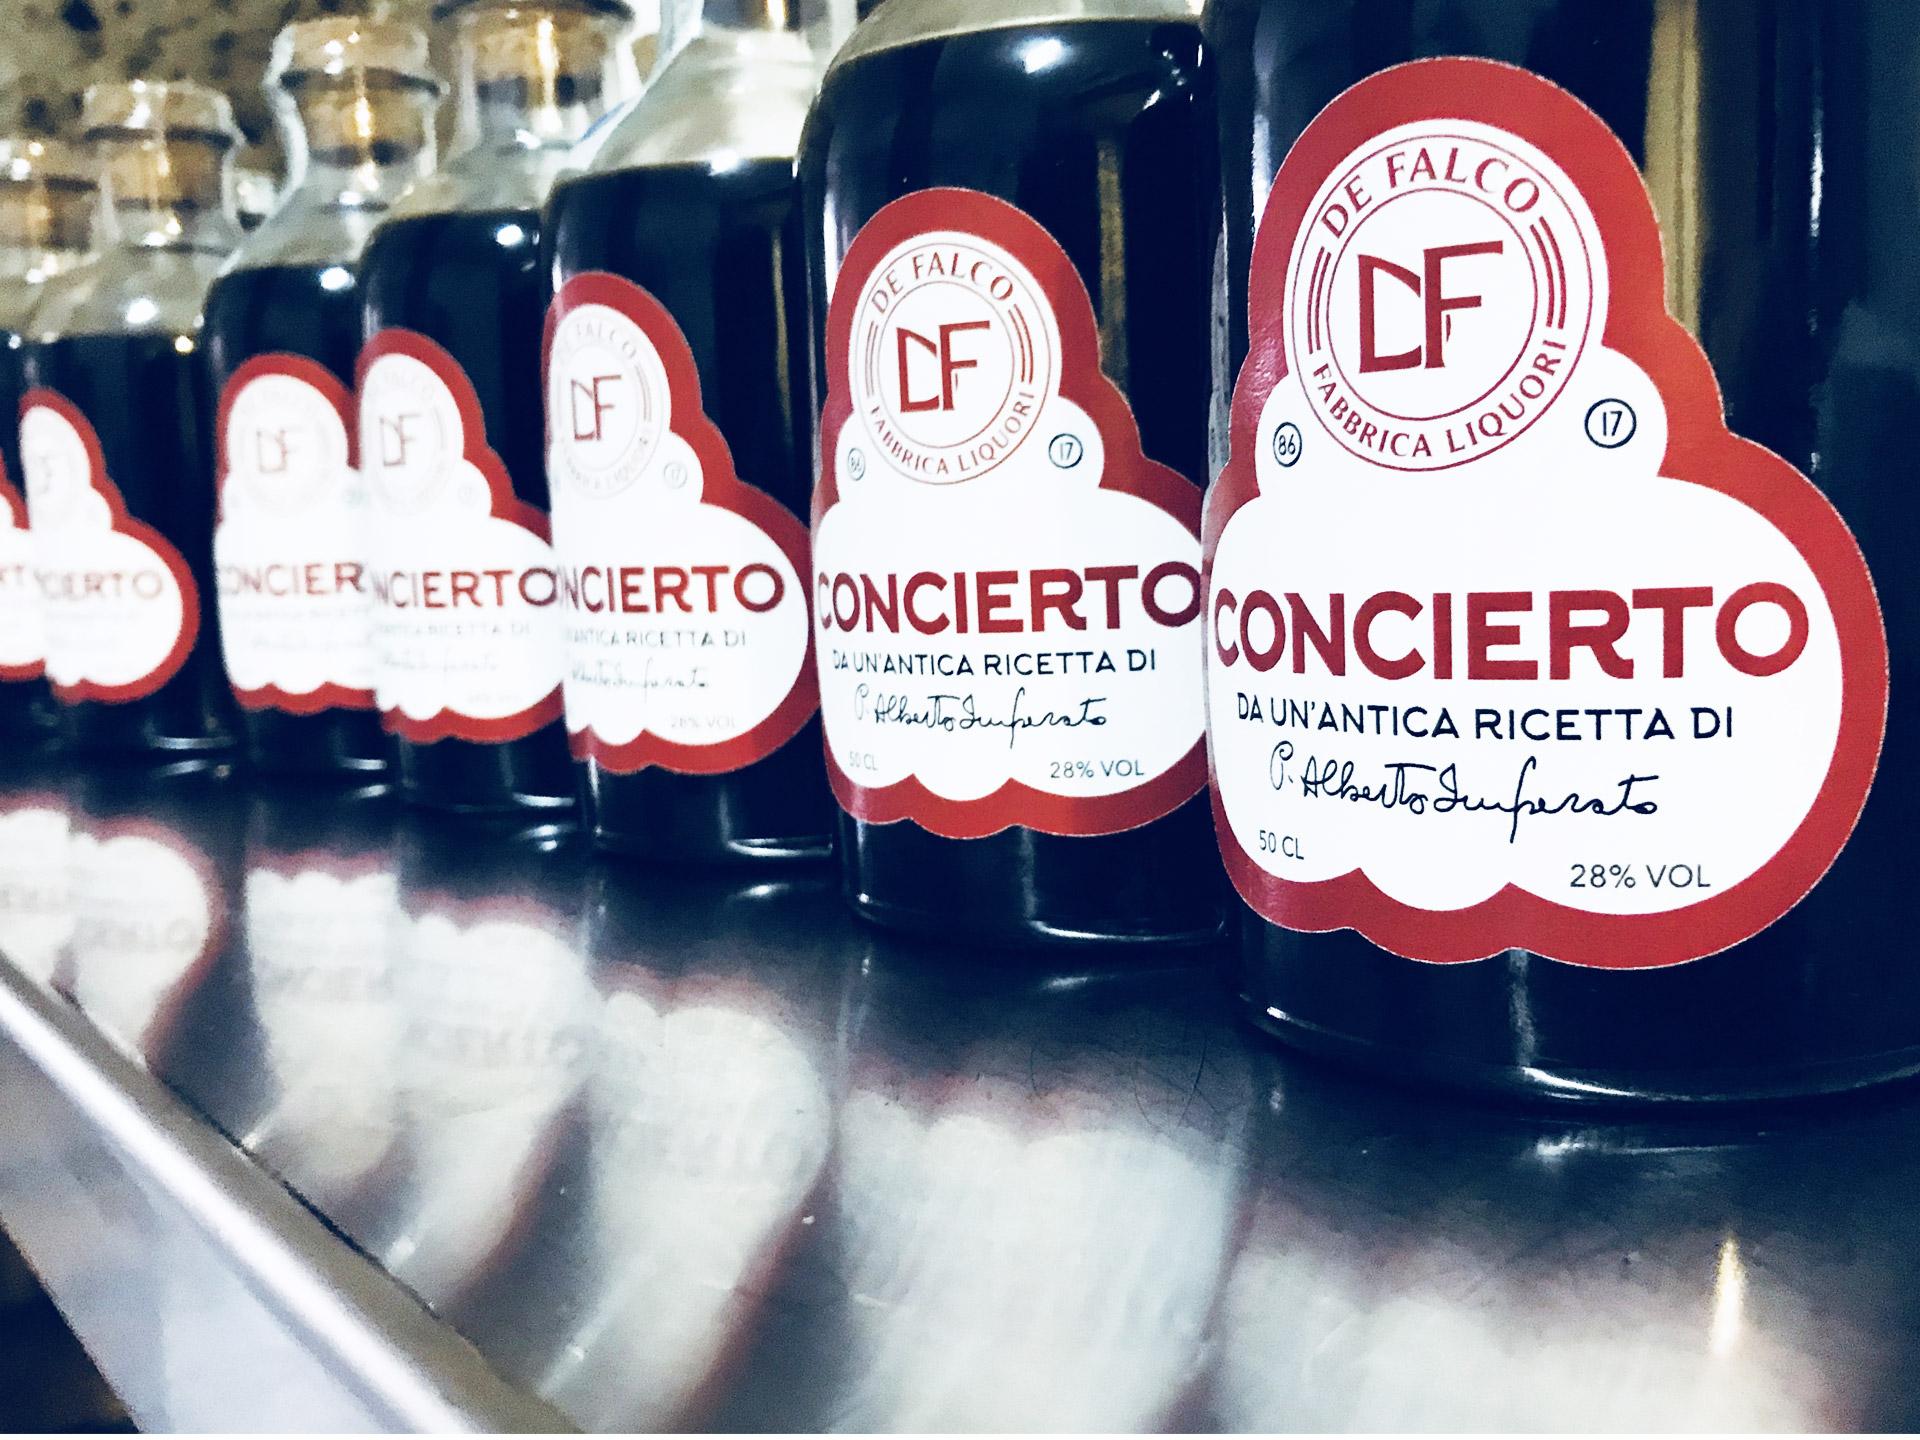 concierto-bottiglie